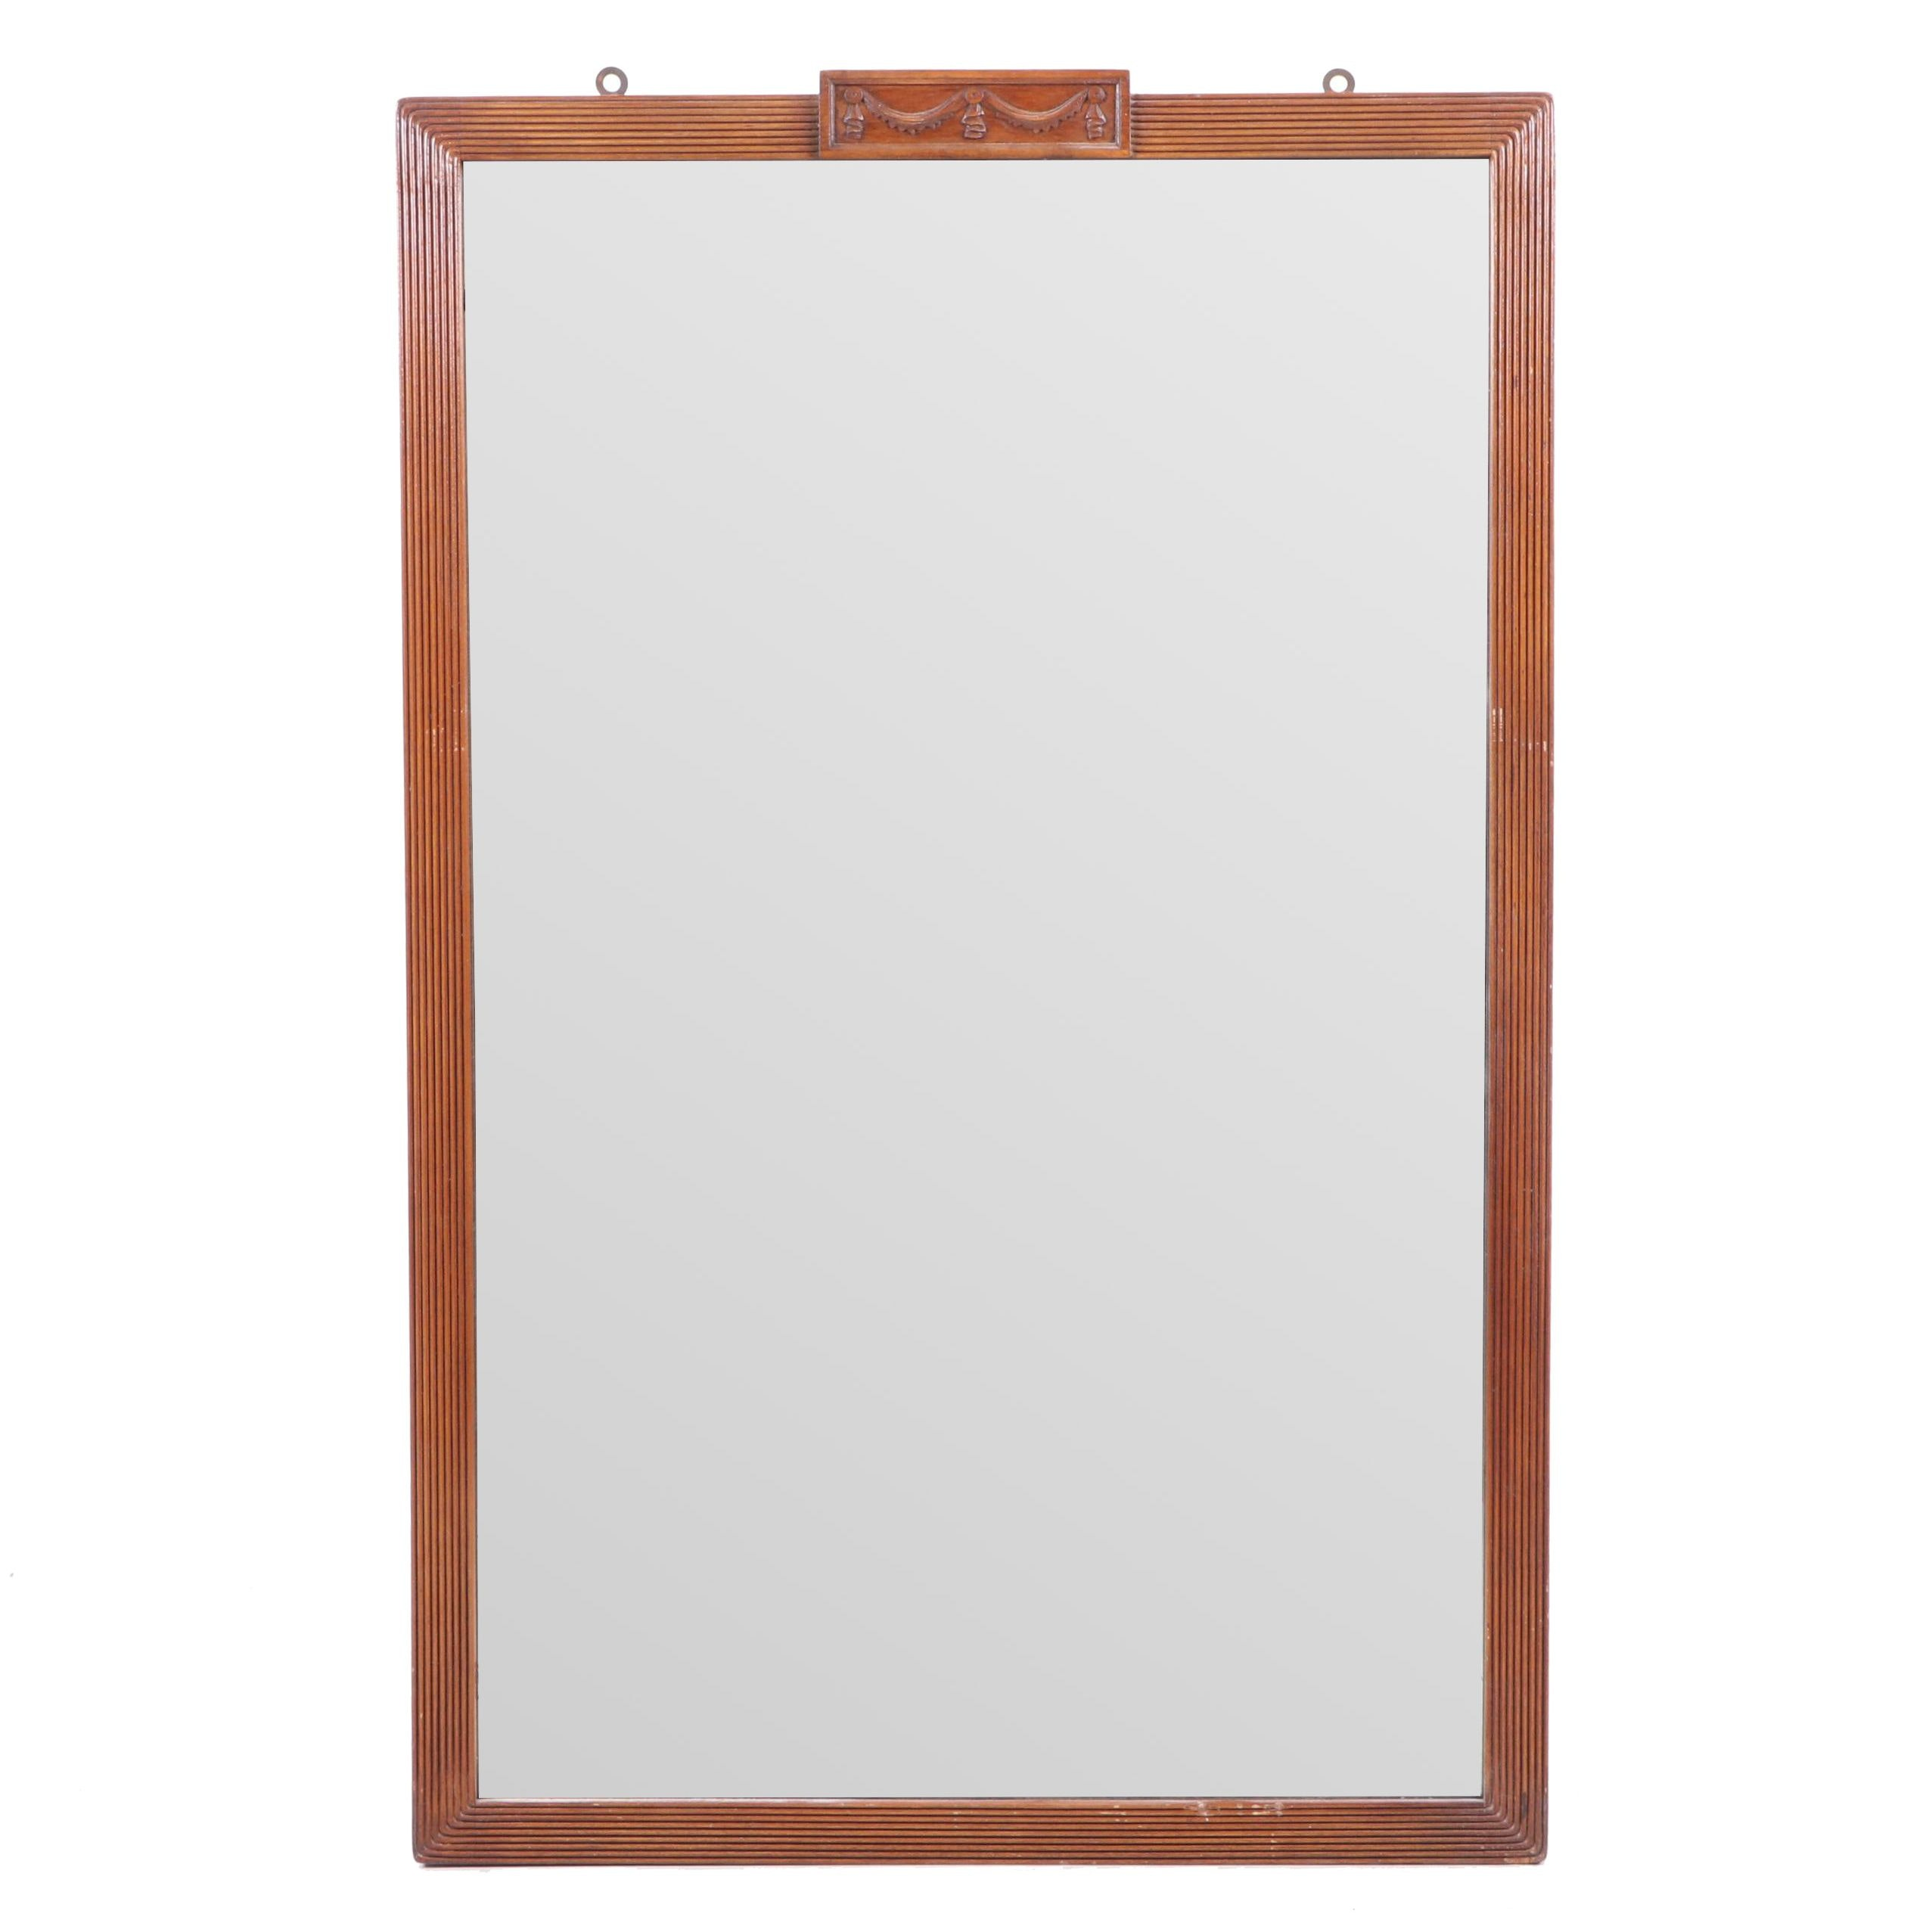 Empire Style Wood Framed Mirror Mirror